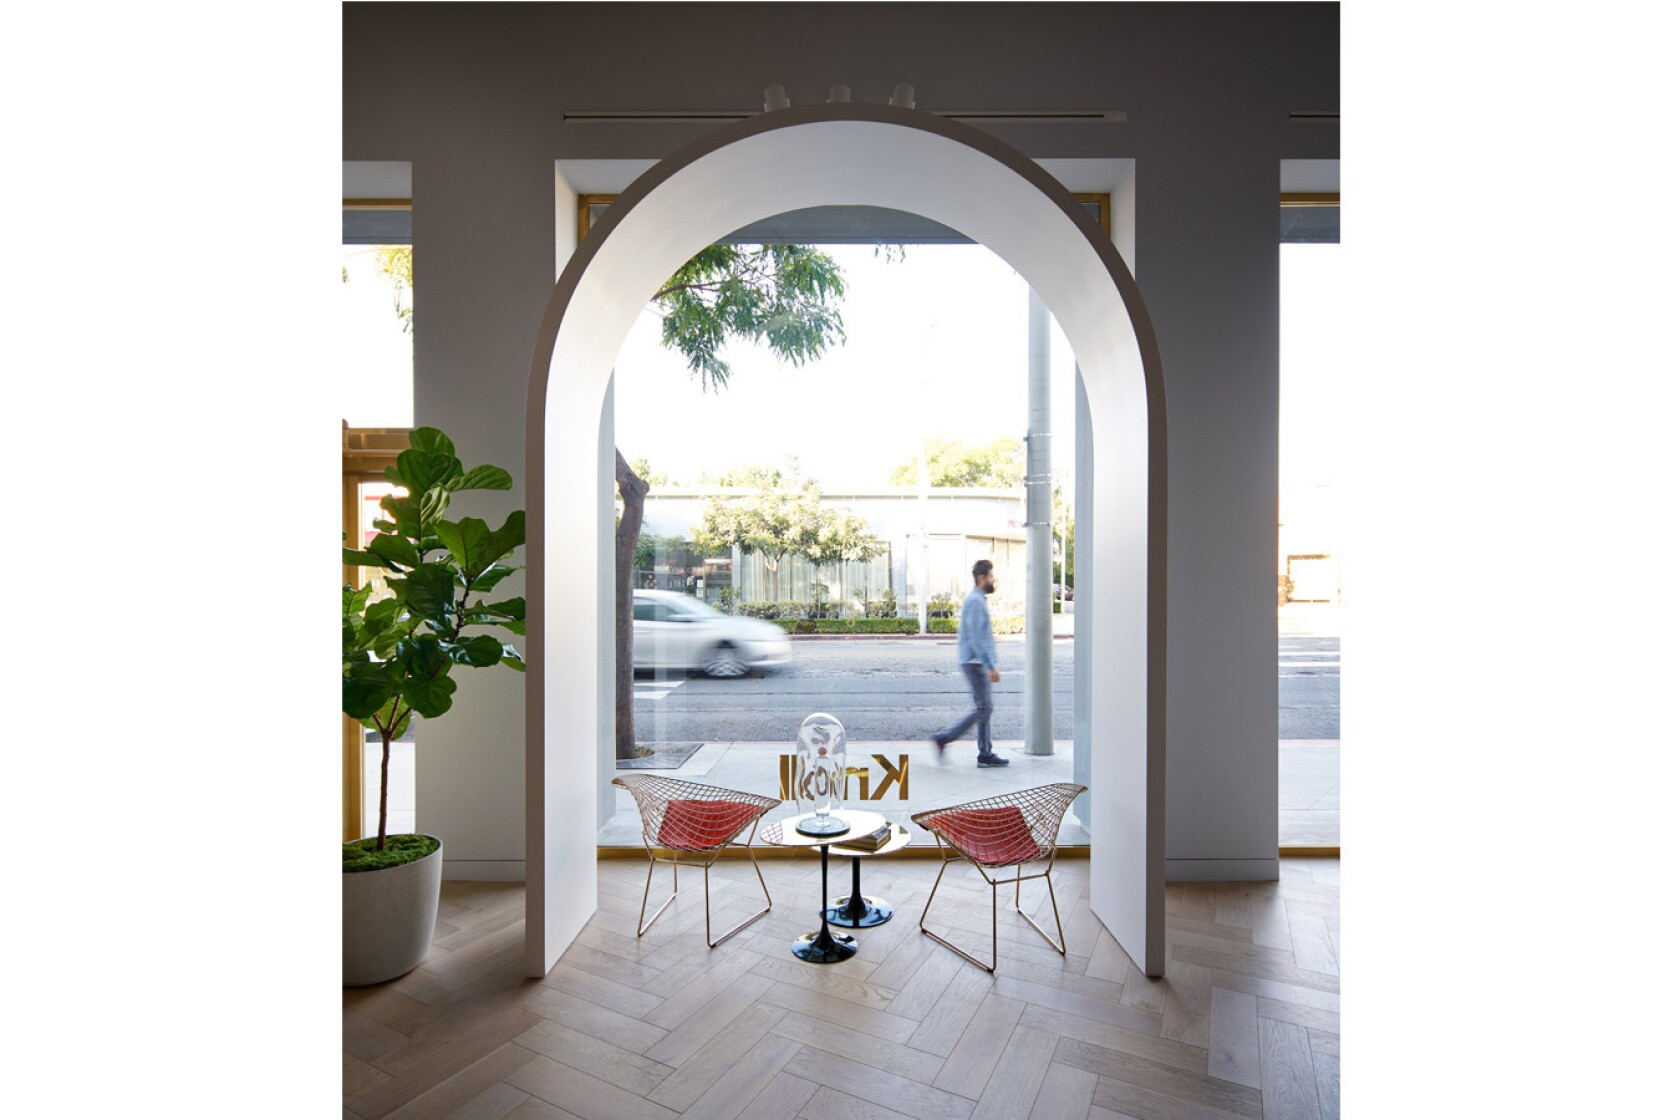 4fff8c1f9b3 Knoll's sleek new showroom opens in West Hollywood - Los Angeles Times